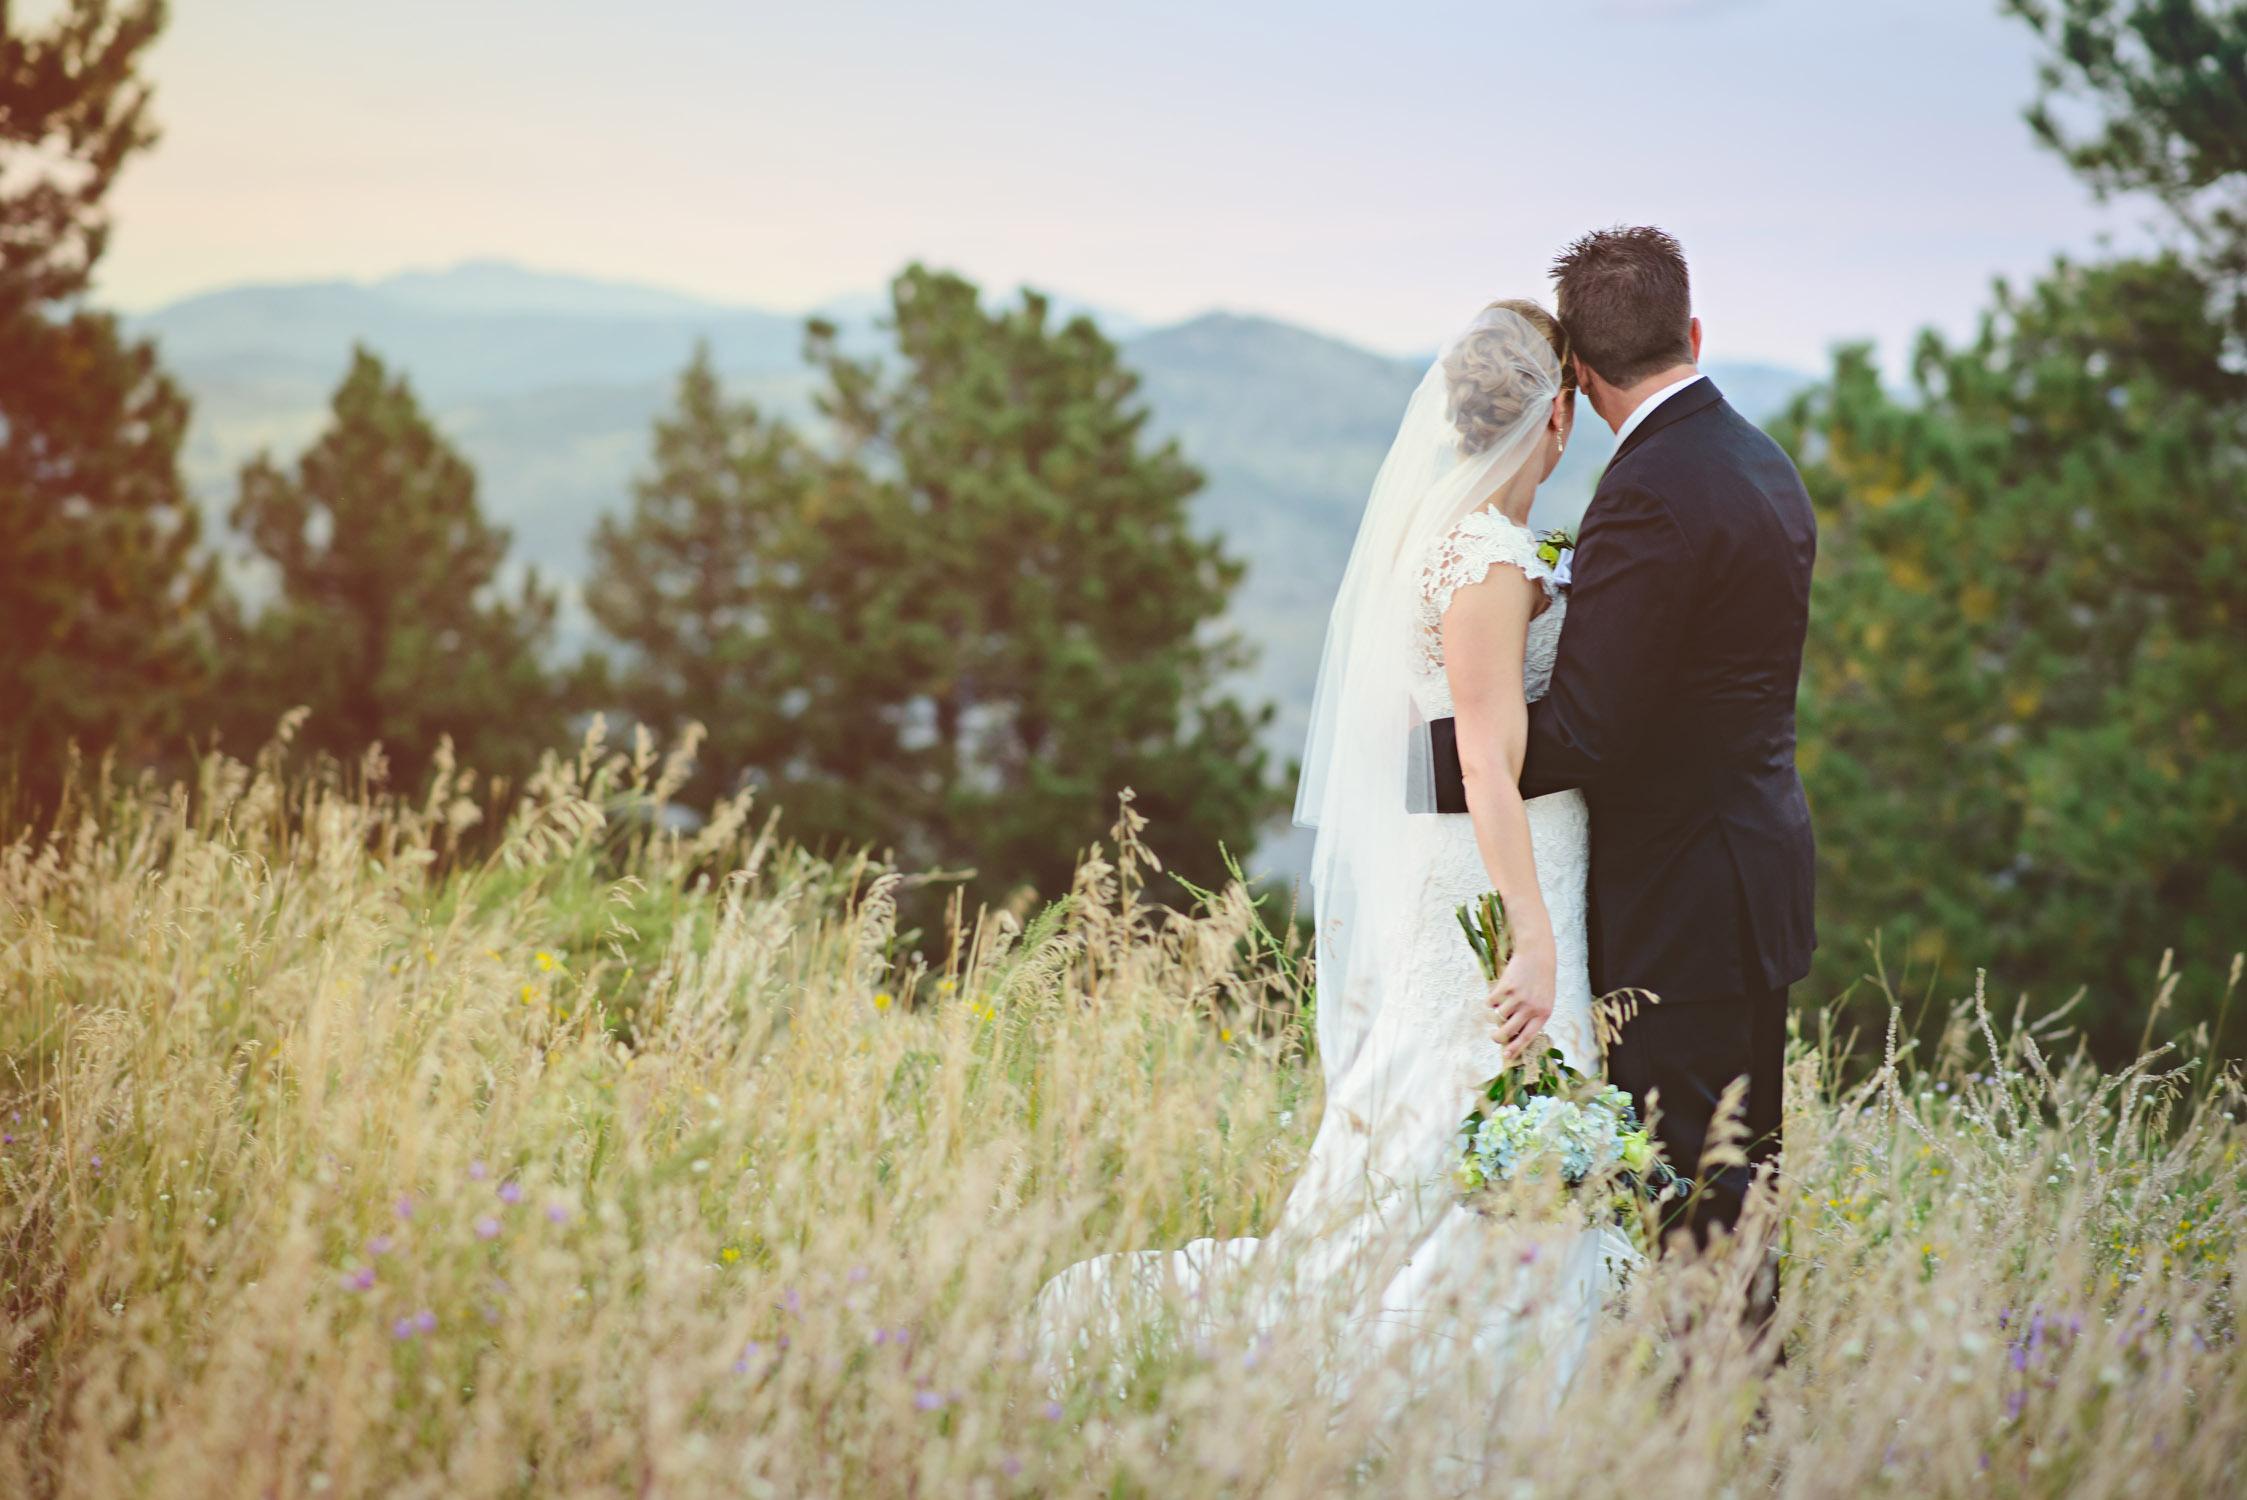 Joanna_Jason_Golden_Colorado_Wedding_11.jpg